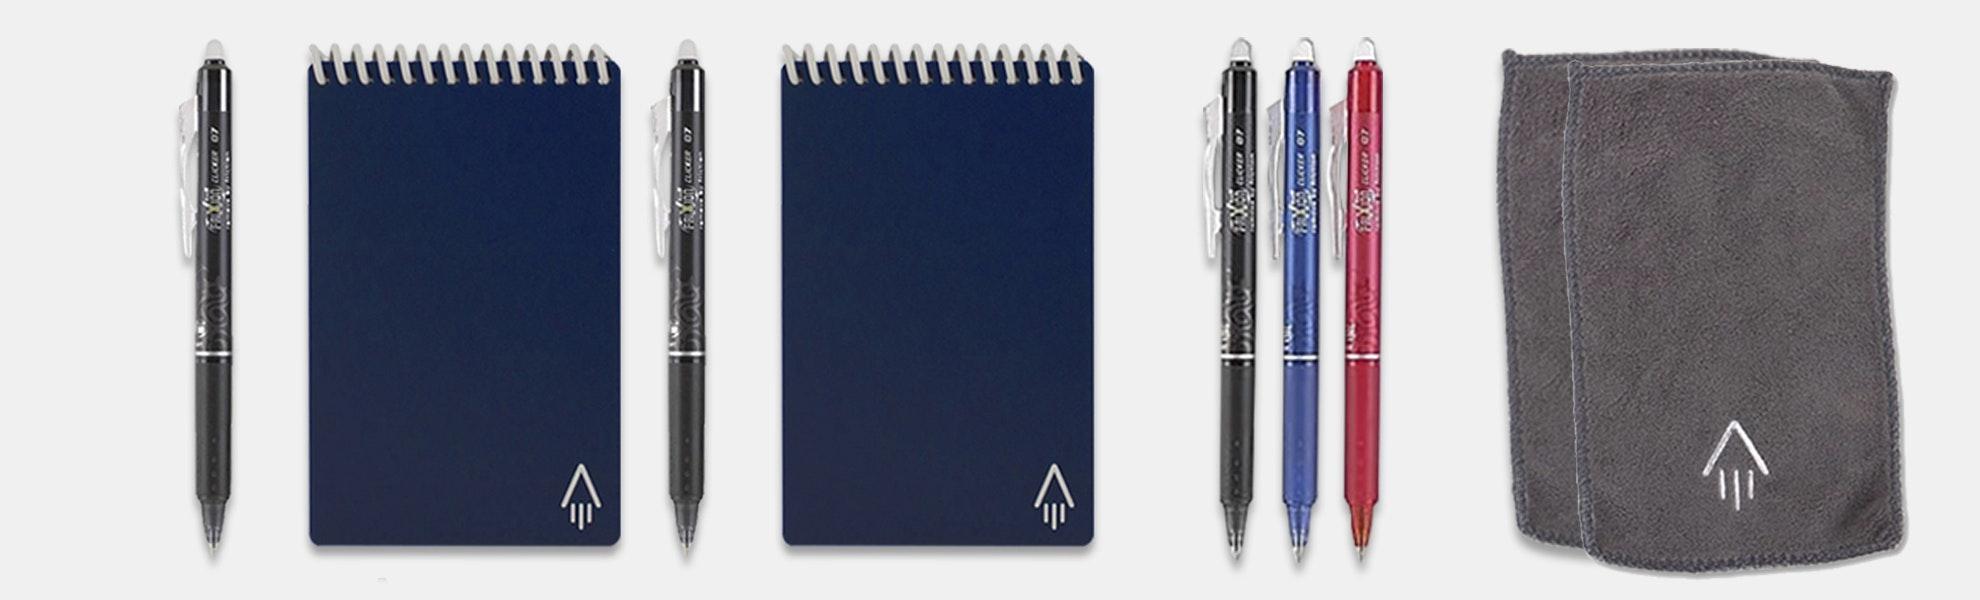 Rocketbook Everlast Mini Smart Notebook (2-Pack)